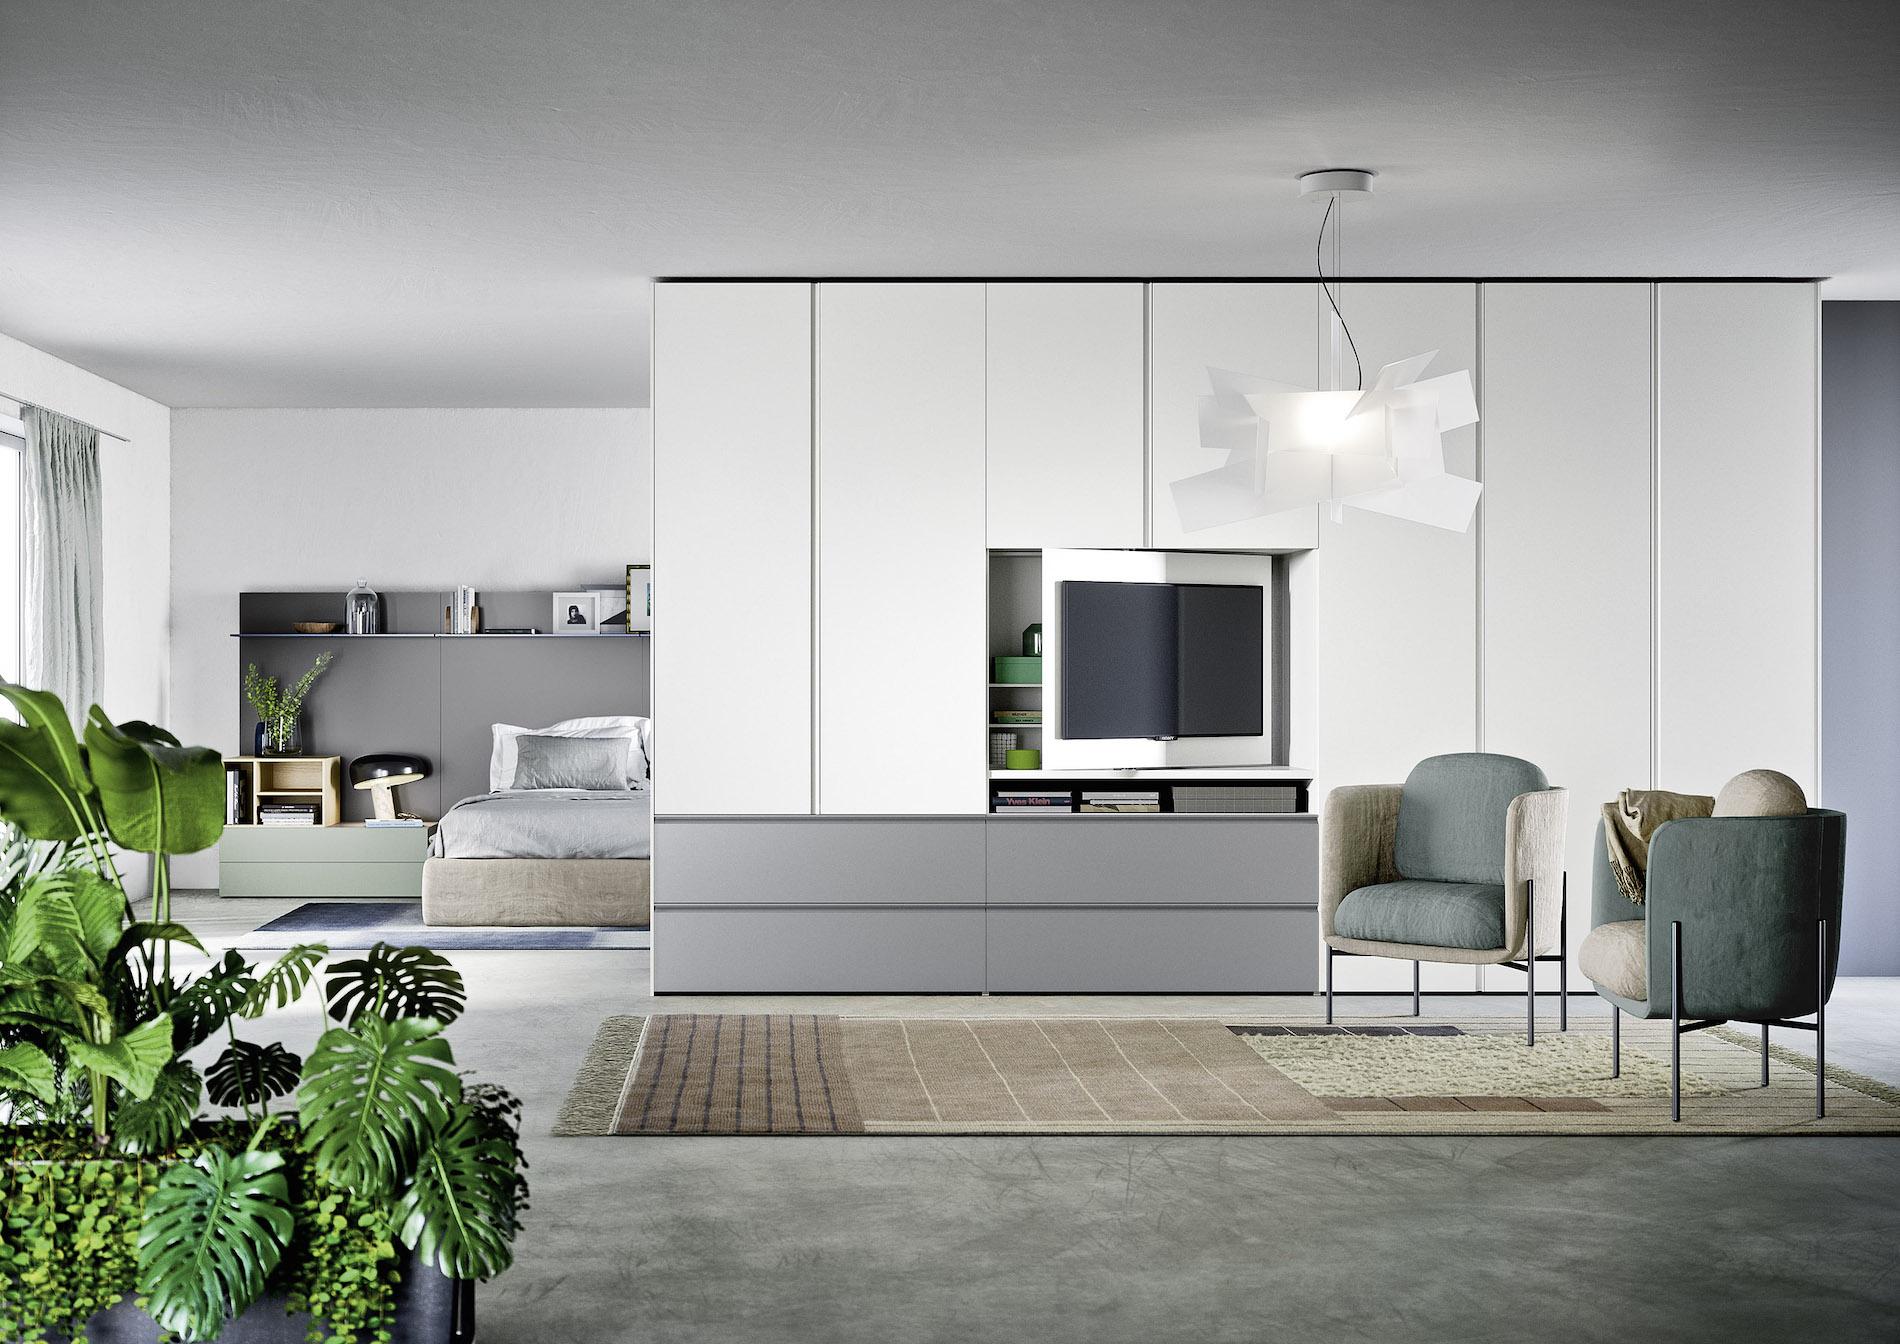 Guardaroba Con Porta Tv.Gola Armadio Porta Tv Di Design Novamobili